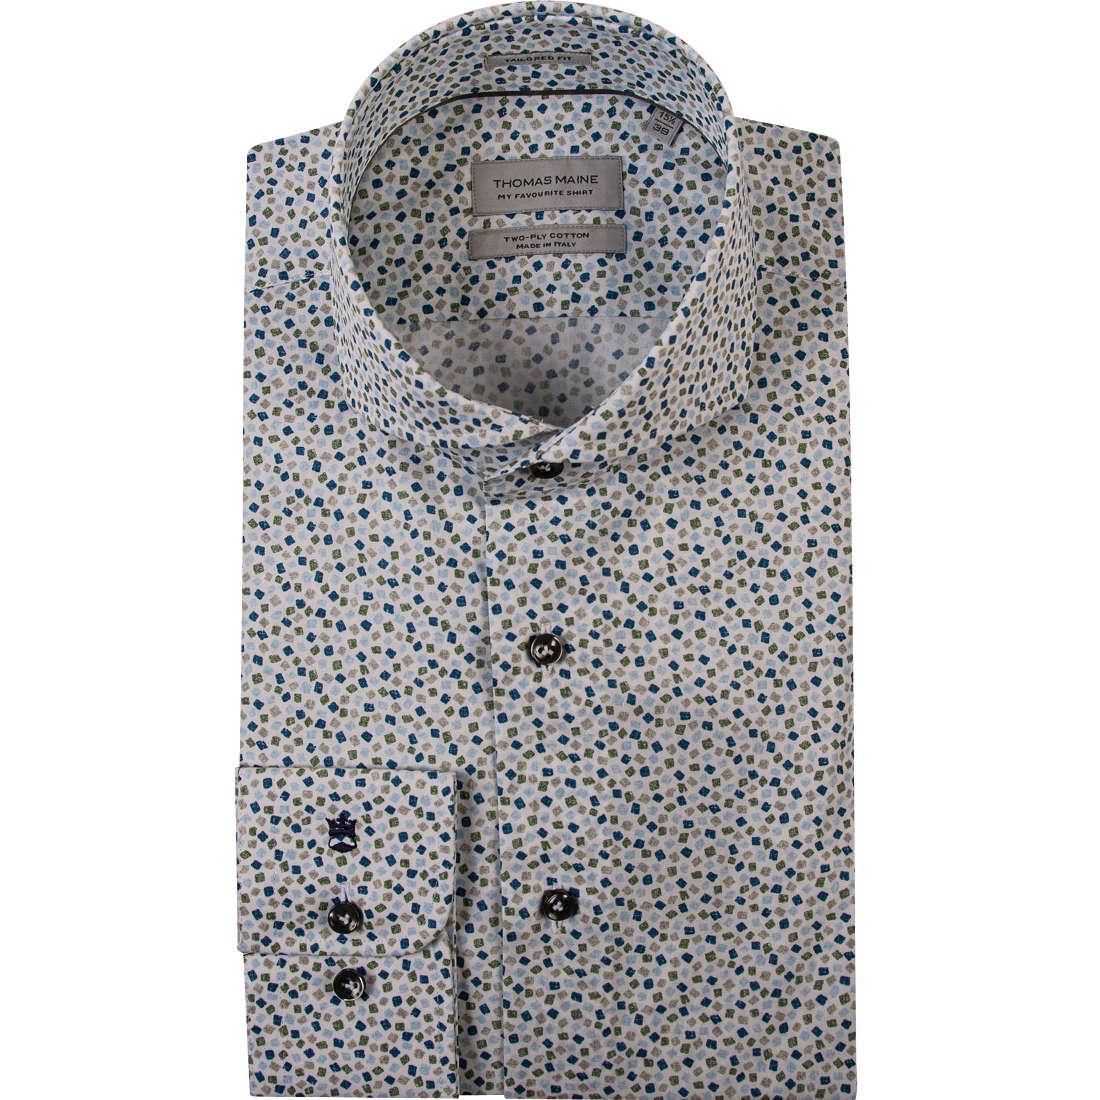 Thomas Maine overhemd Tailored Fit 91-7775 in het Wit/Groen